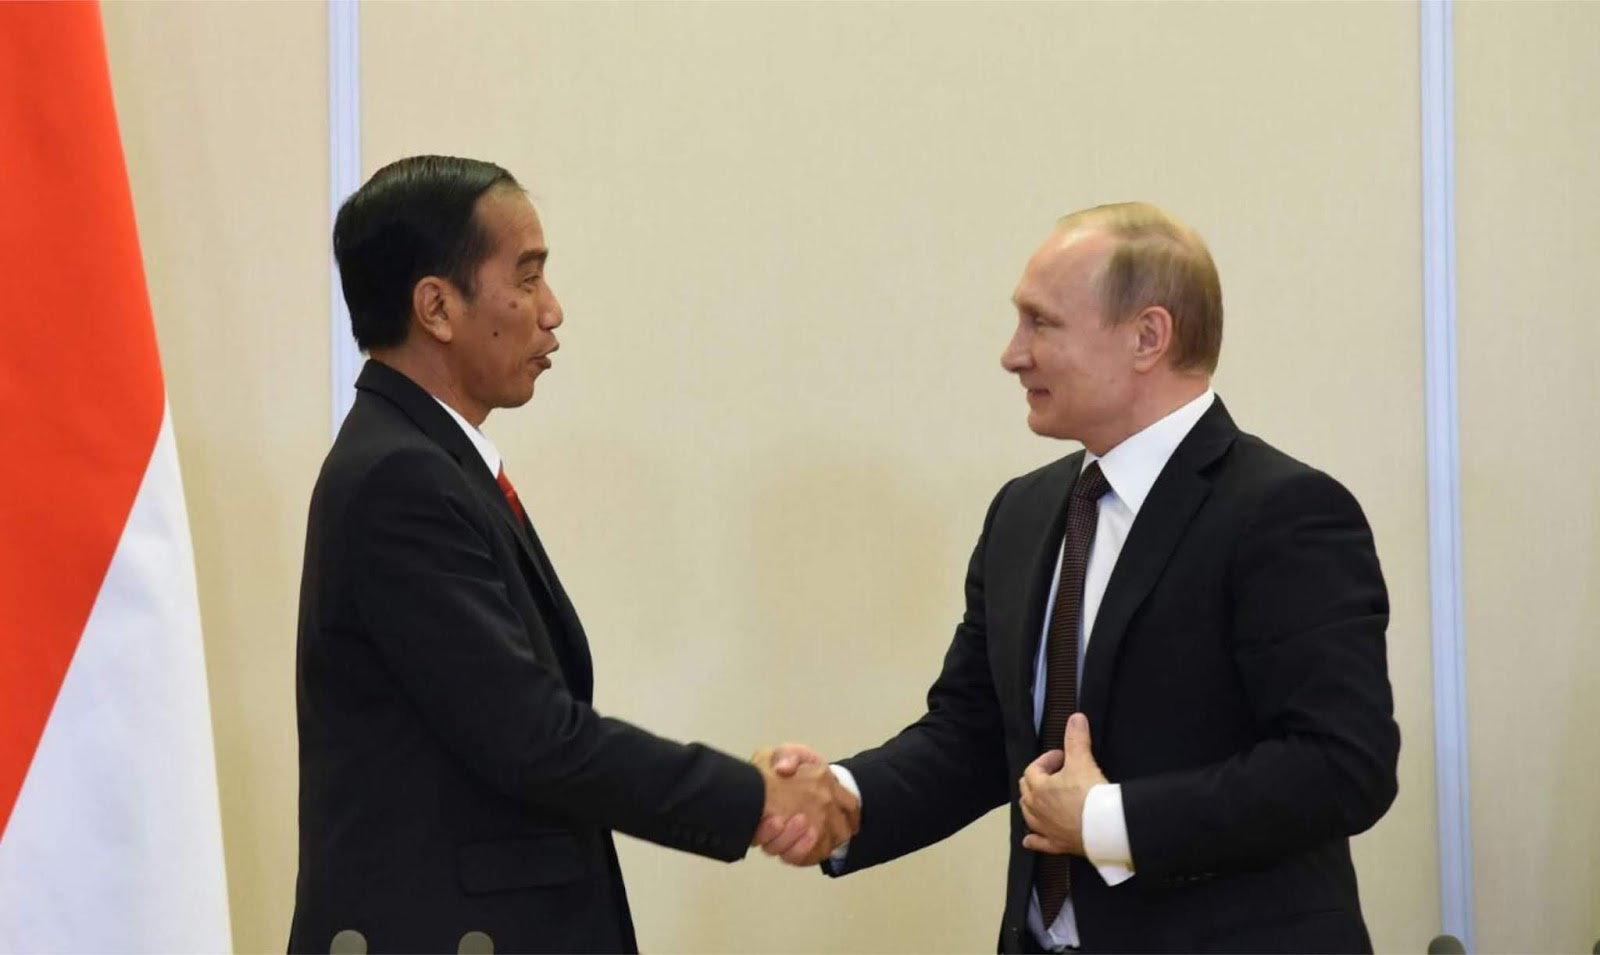 Presiden Jokowi Akan Bertemu Presiden Putin di sela KTT ASEAN di Singapura